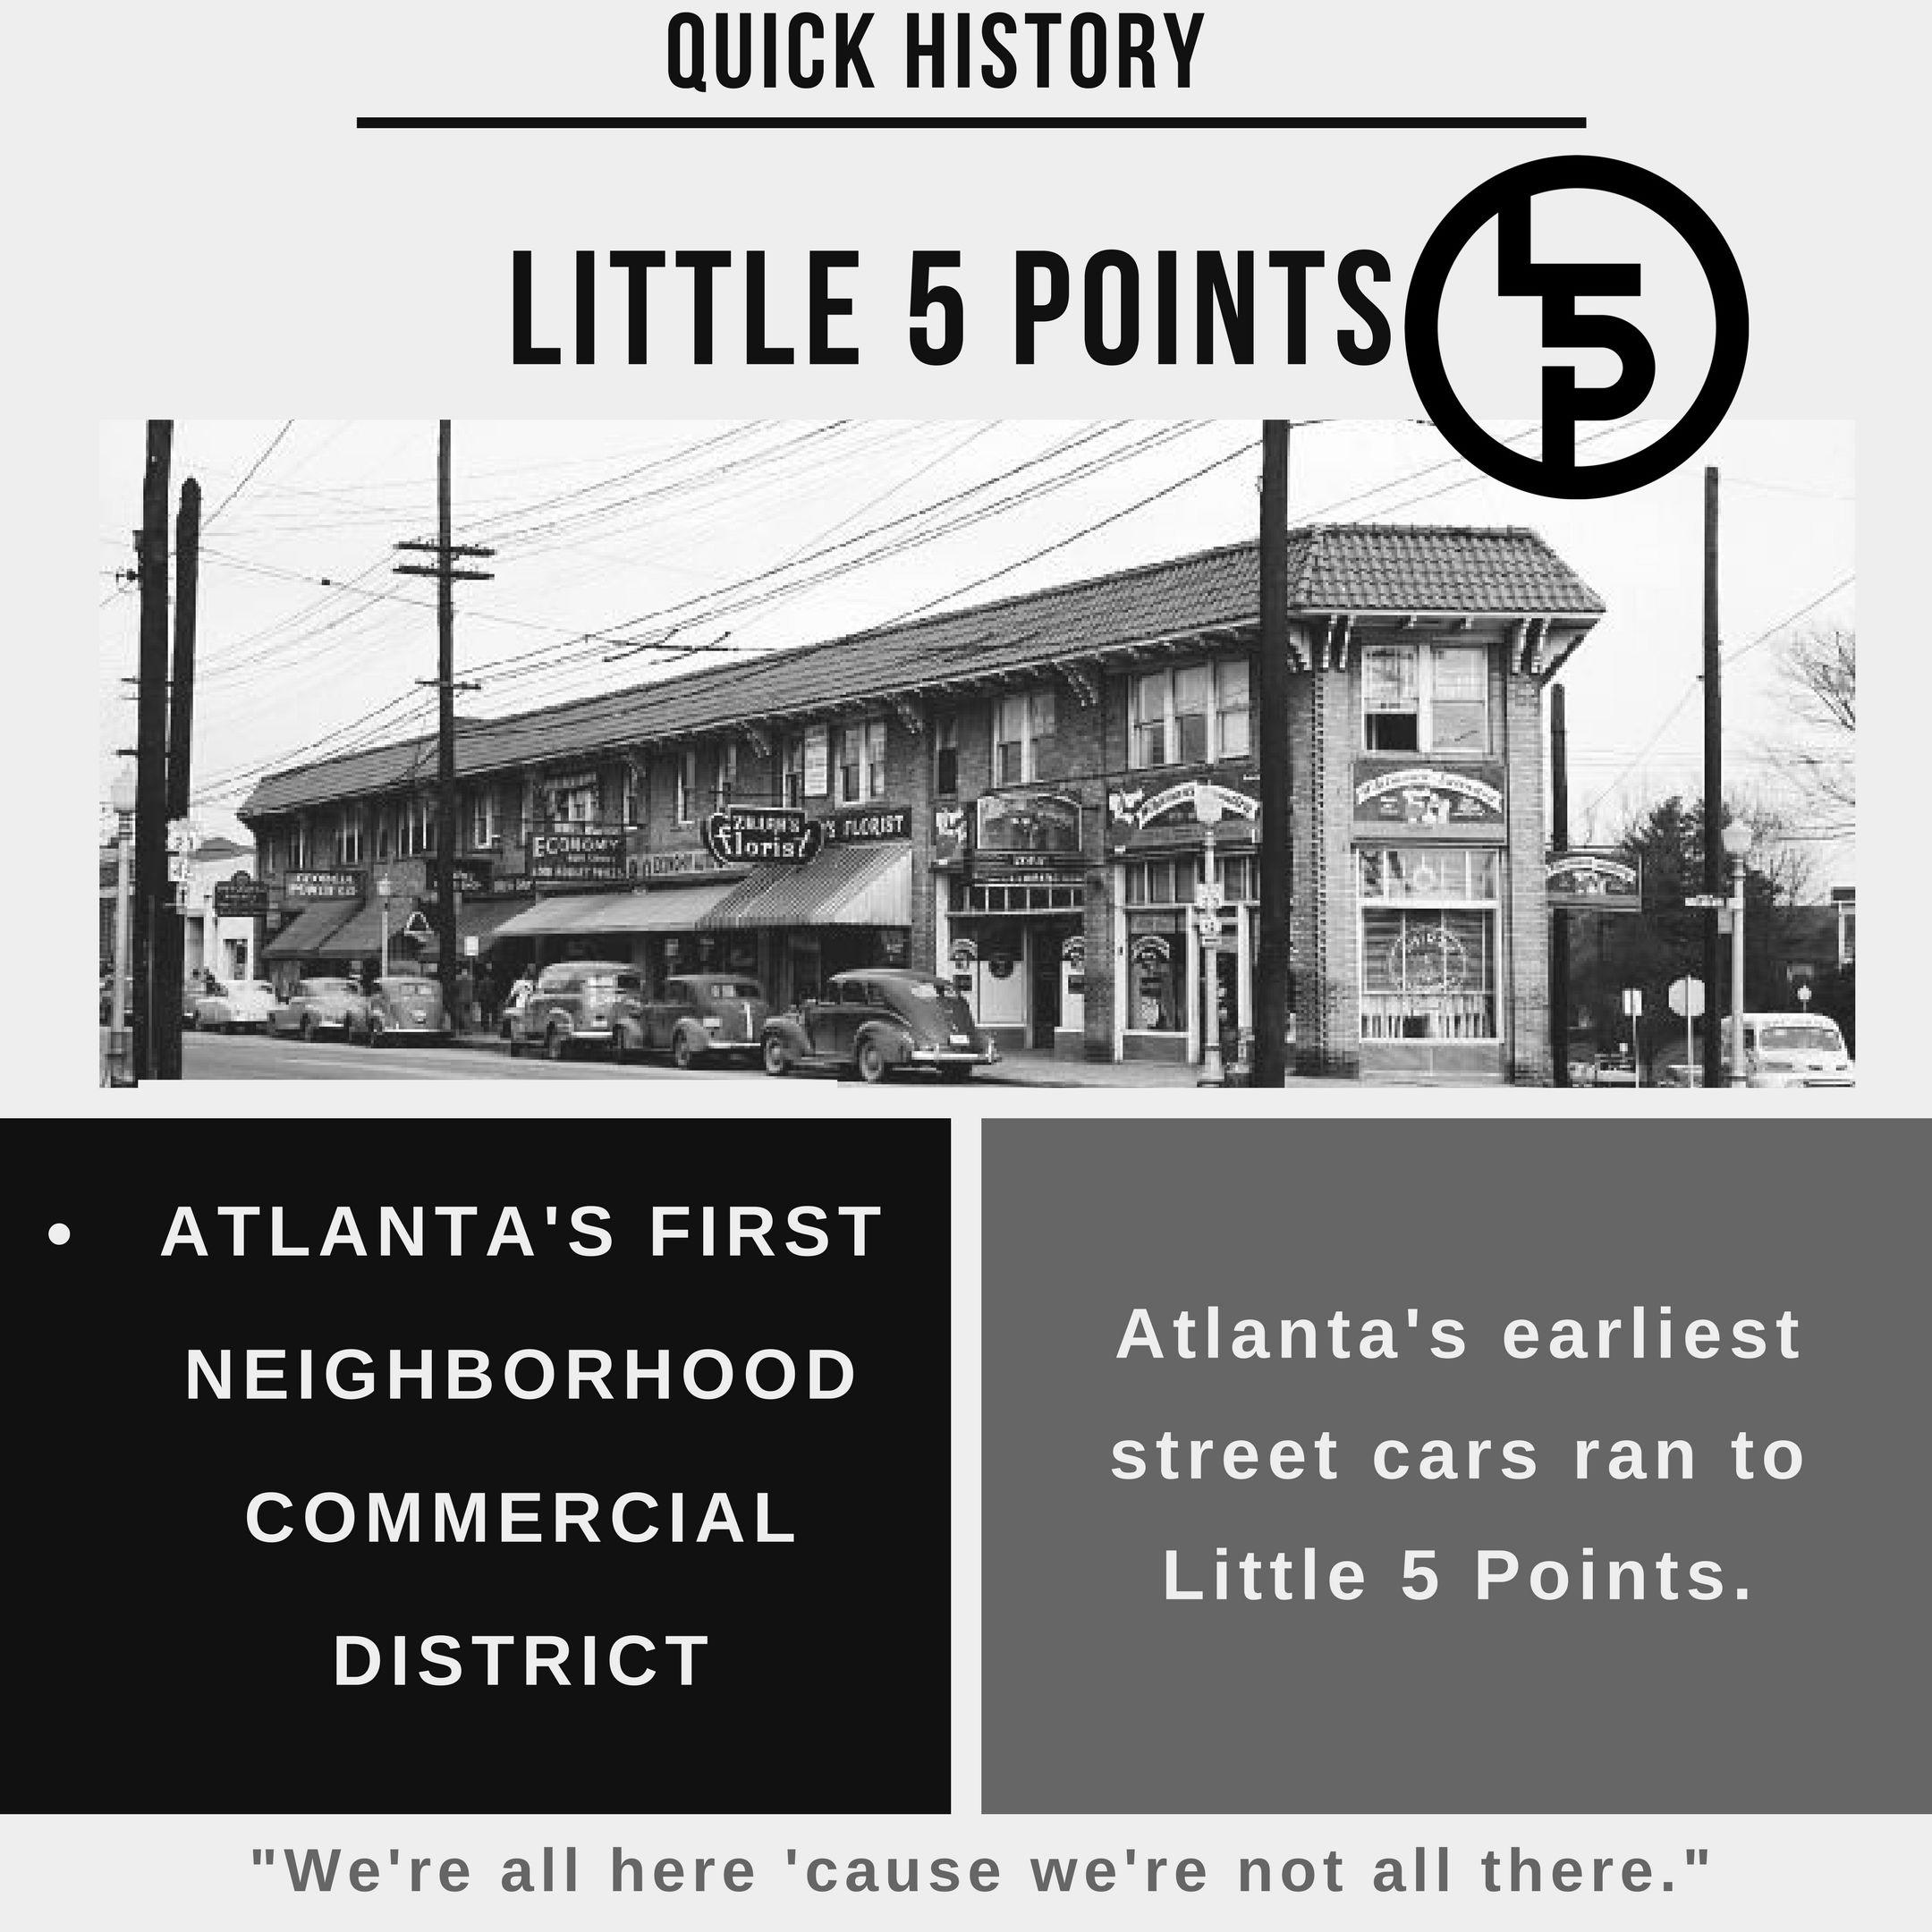 history_littlefivepoints_atlanta-2018.jpg